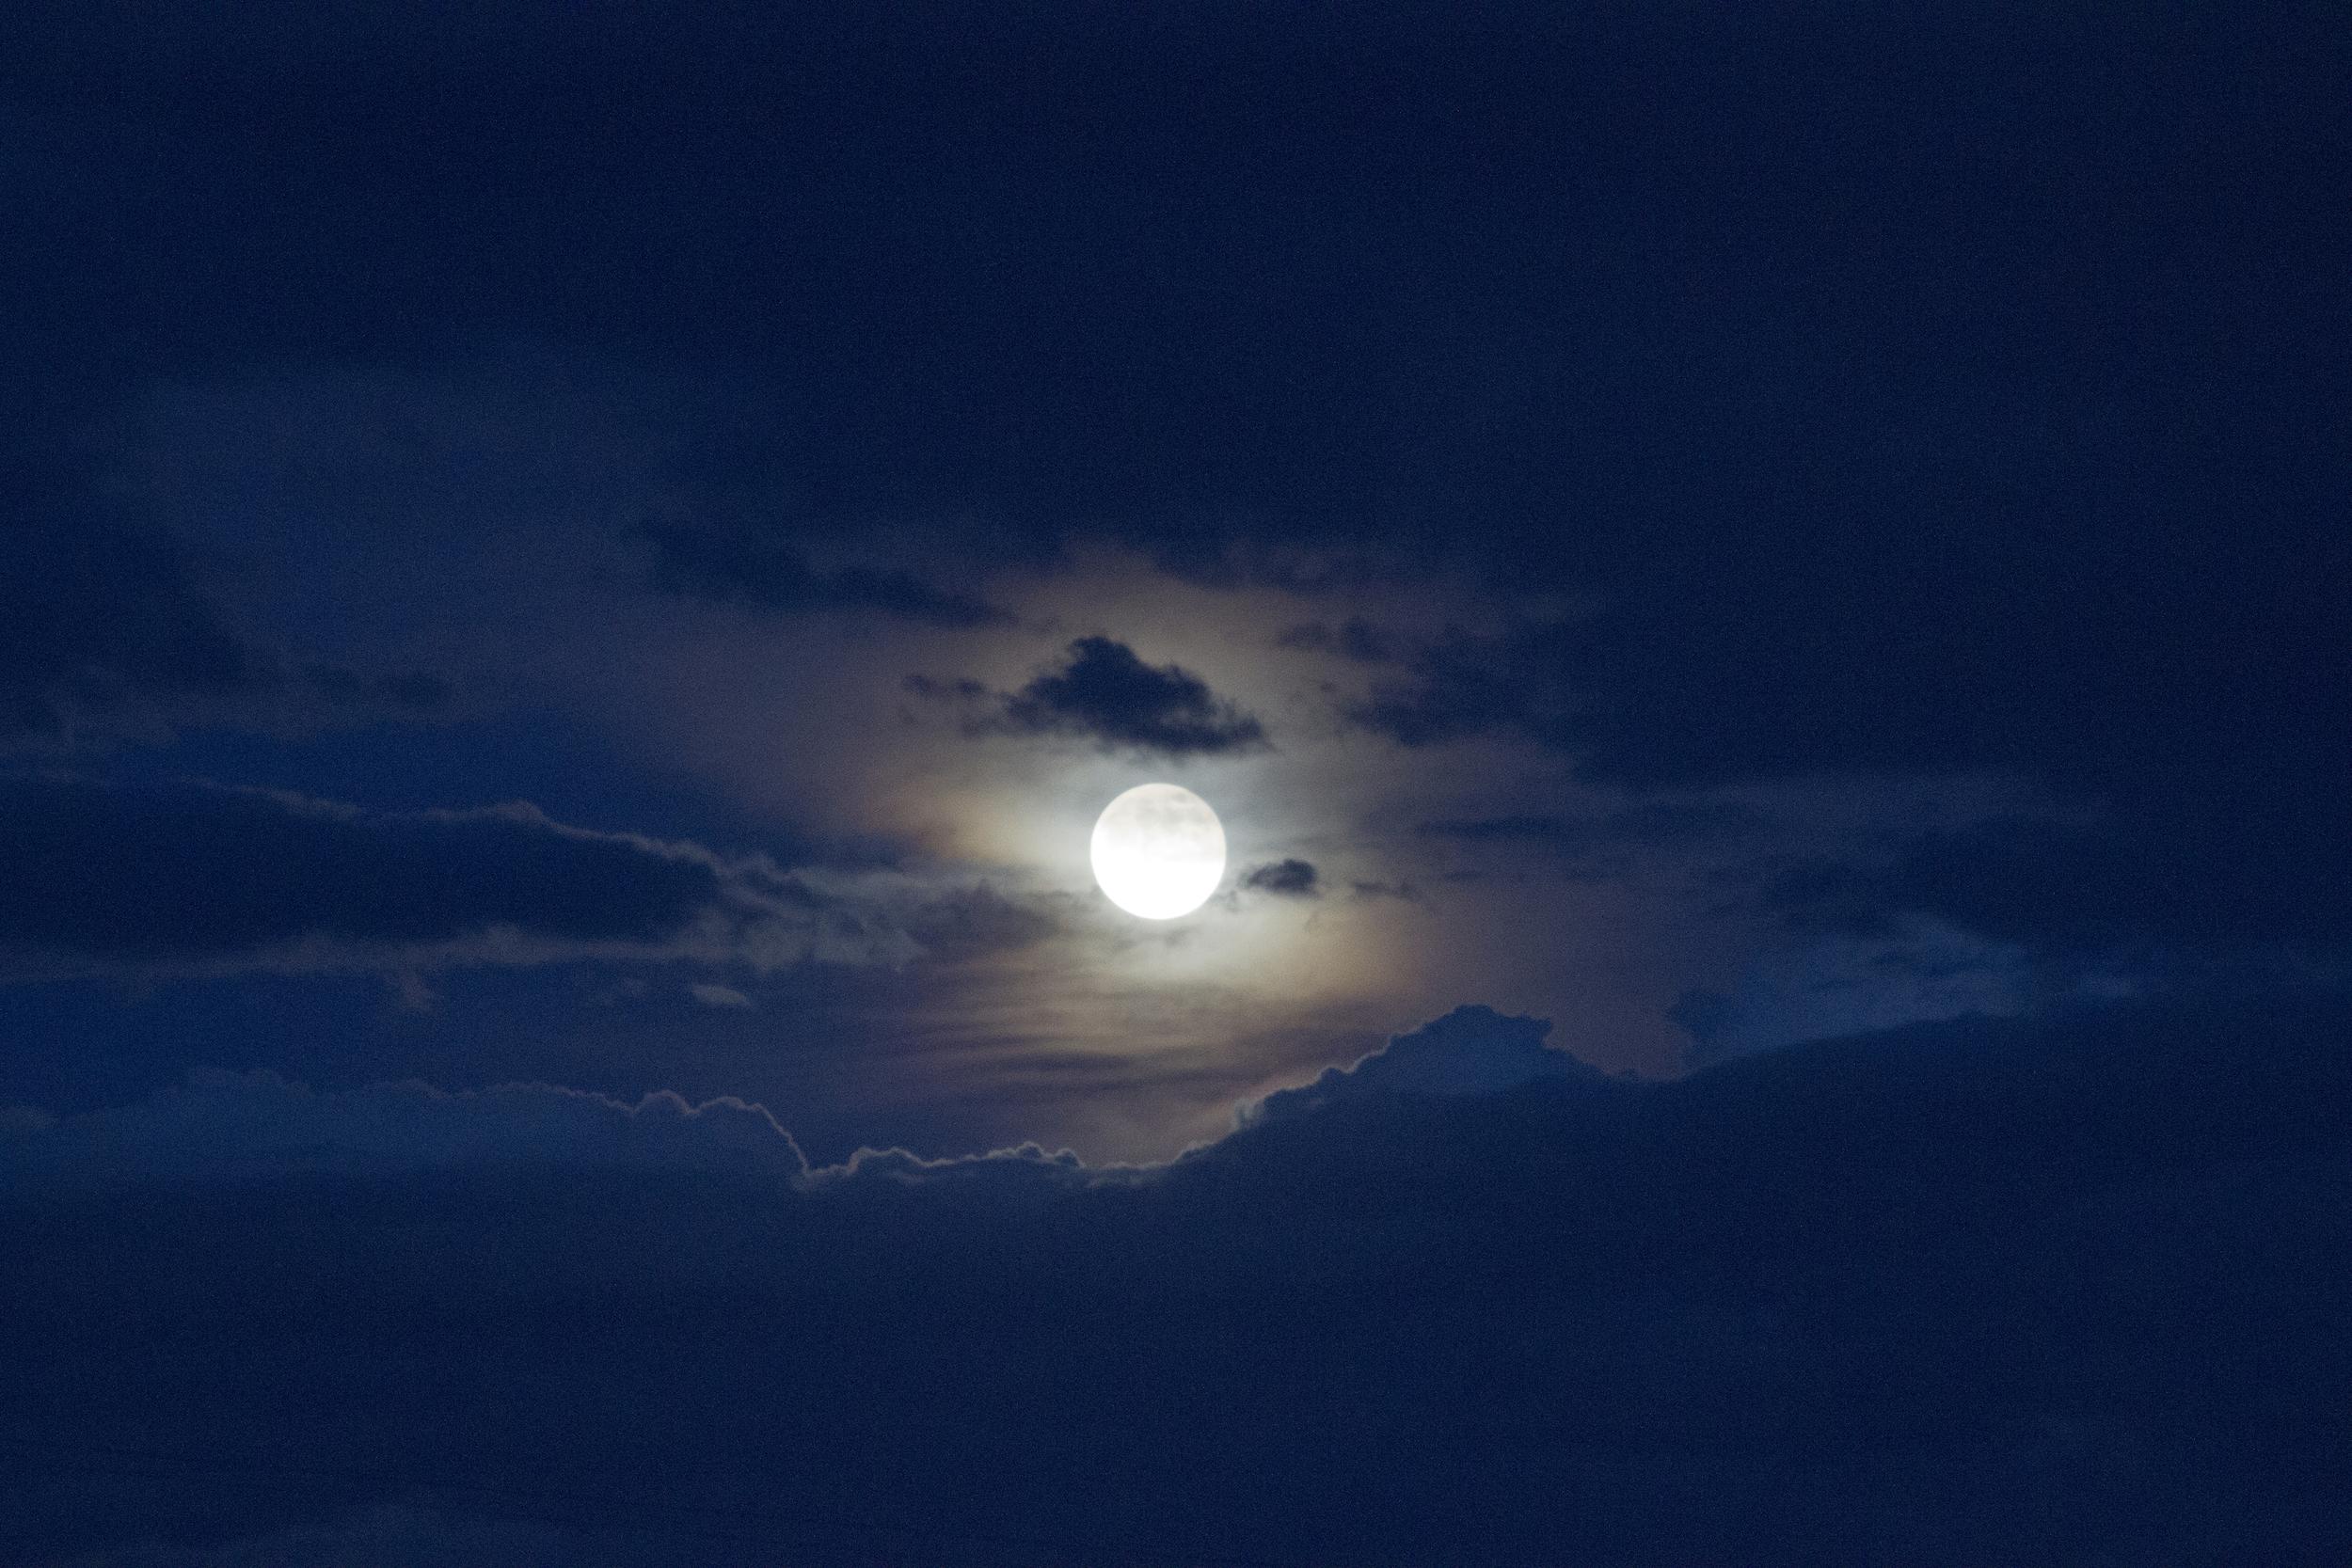 Moonlight fell on lovers' skin